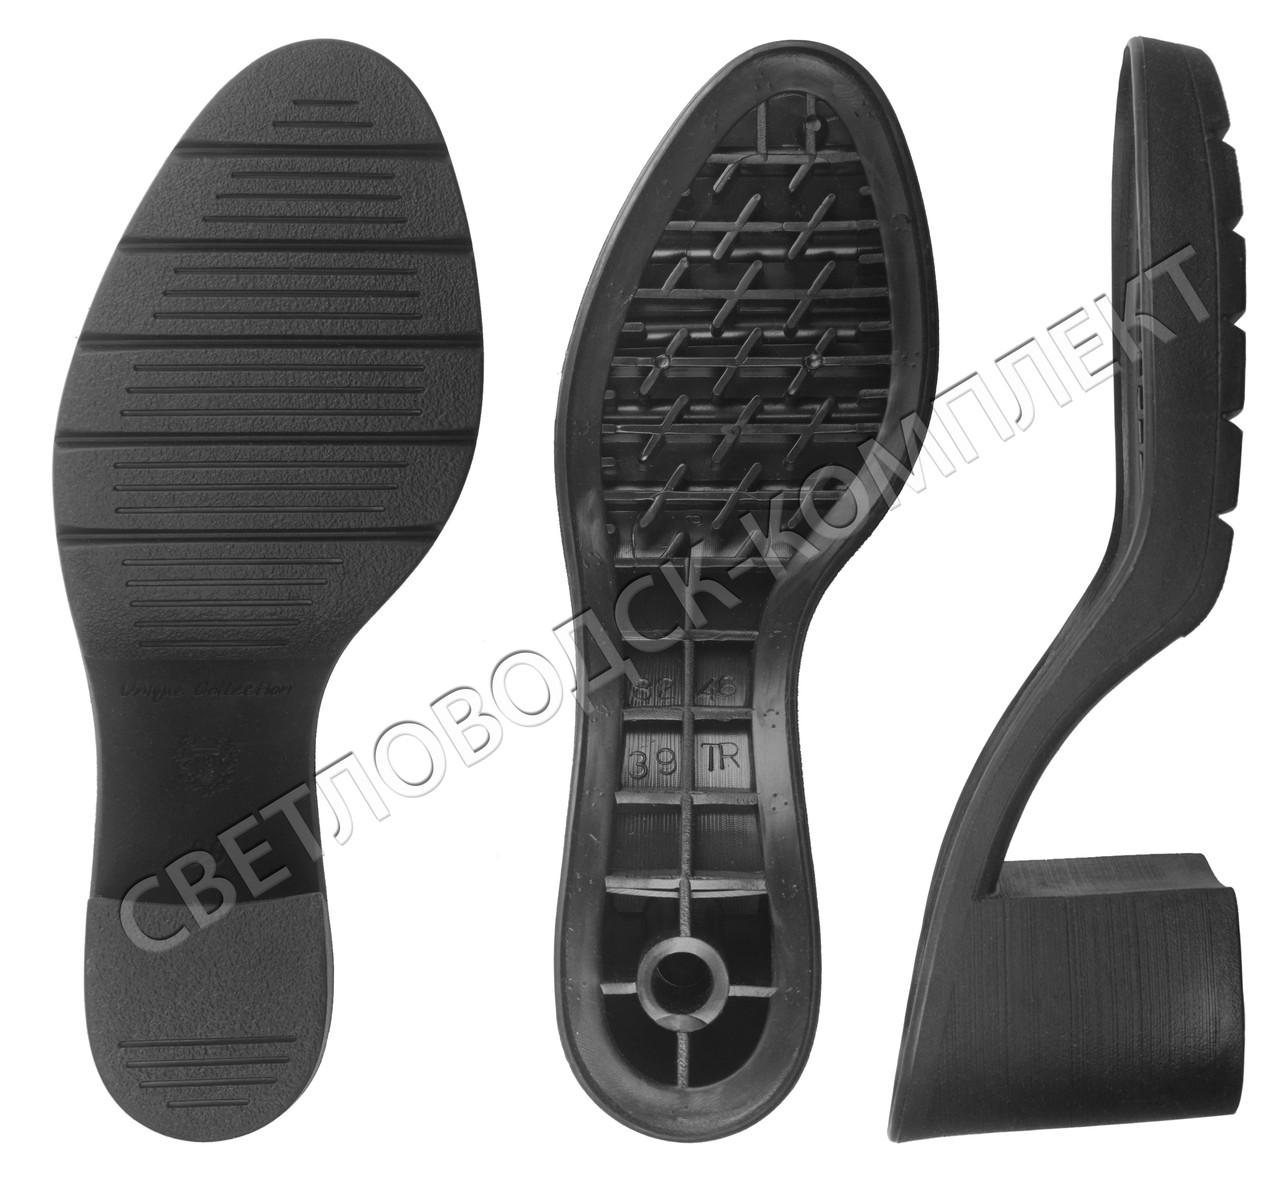 Подошва для обуви TR-8246 черная